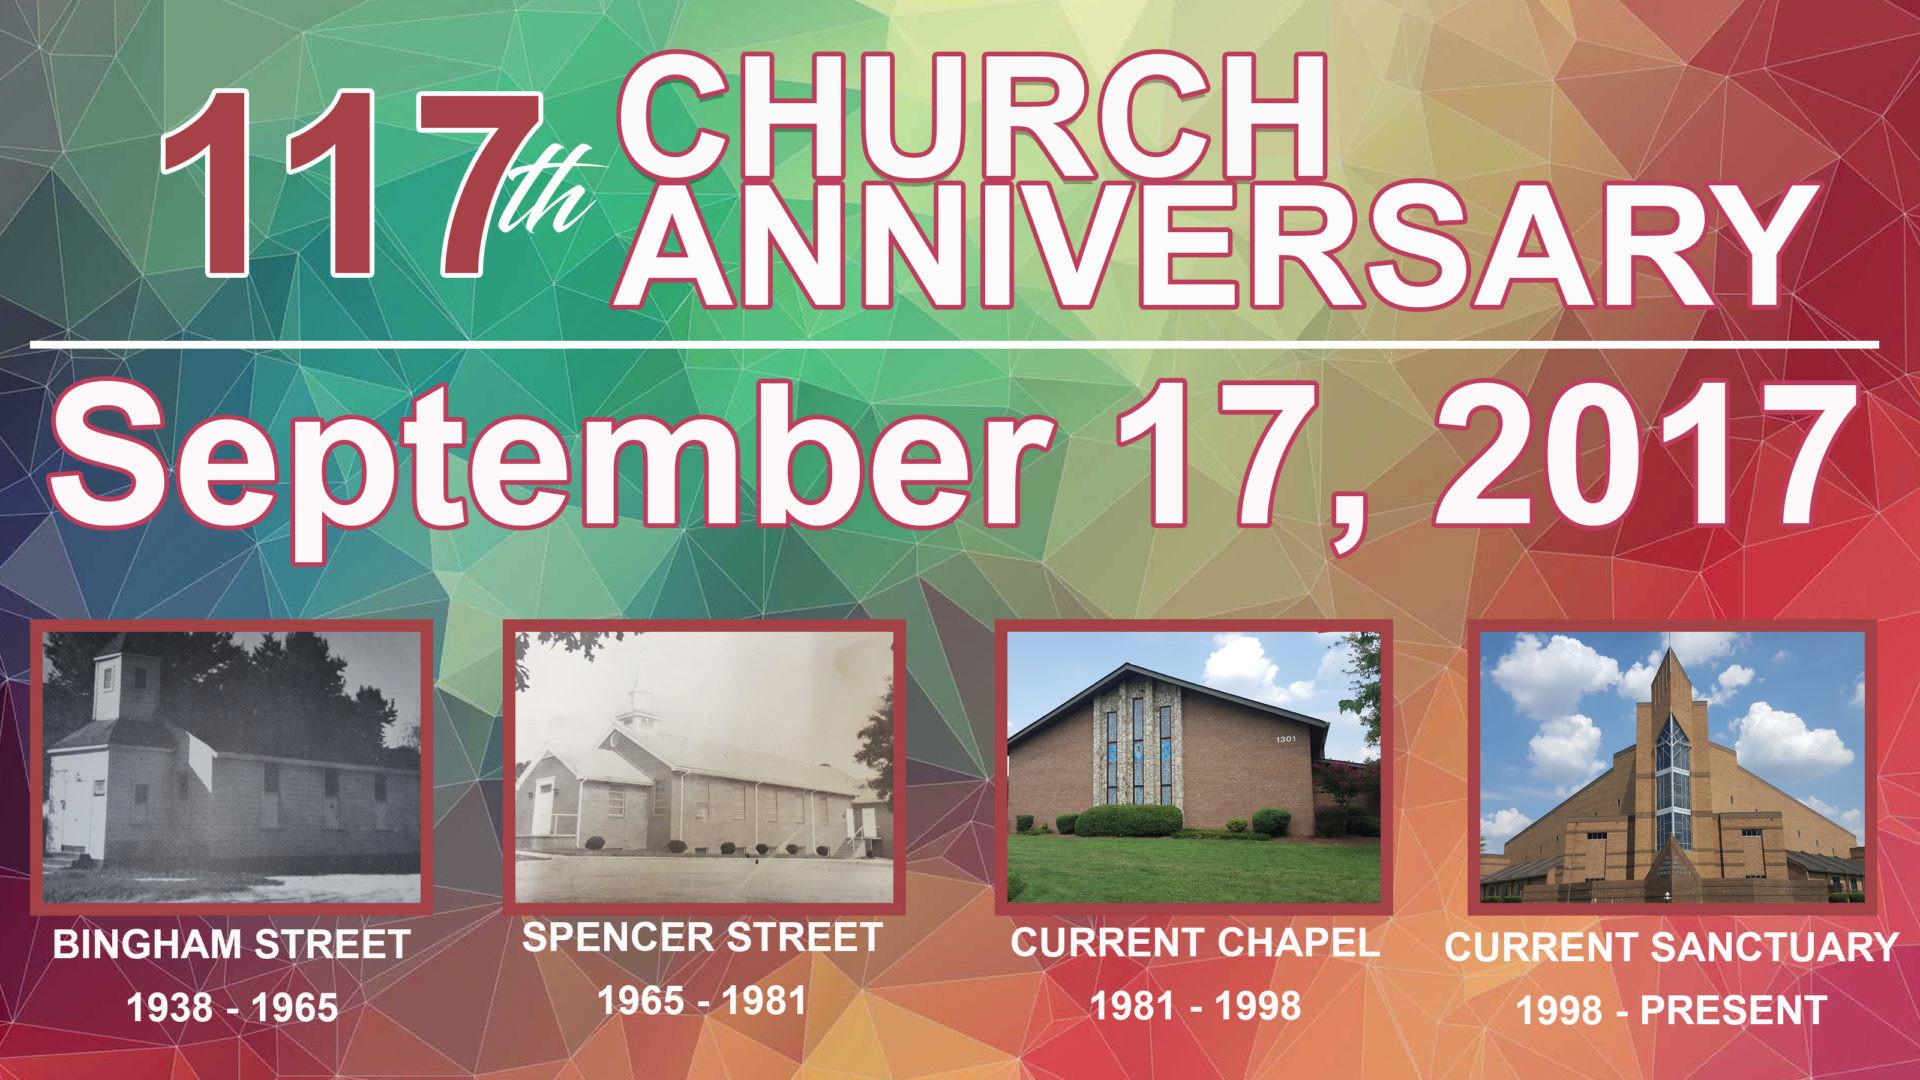 Church Anniversary Wallpaper 62 Images